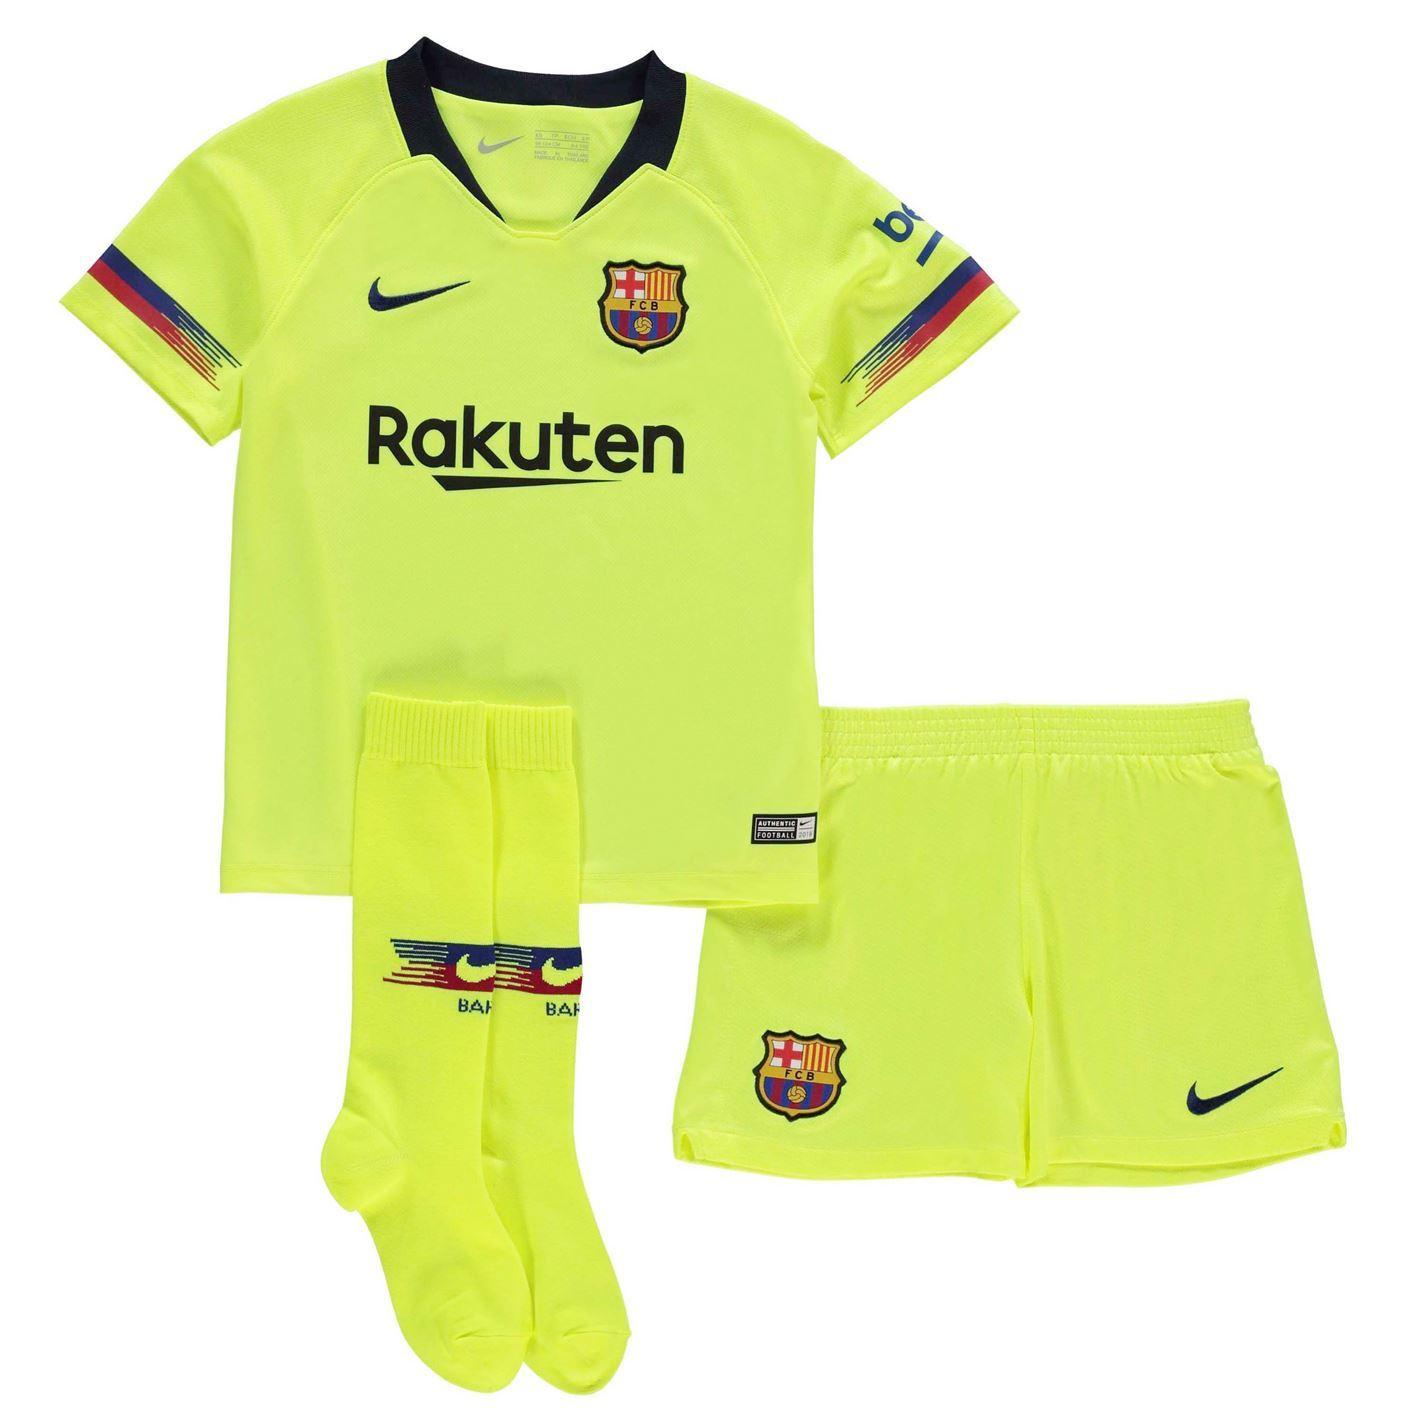 f8eb817f7 ... Nike Barcelona Away Mini Kit 2018 19 Infants Yellow Football Soccer  Strip ...